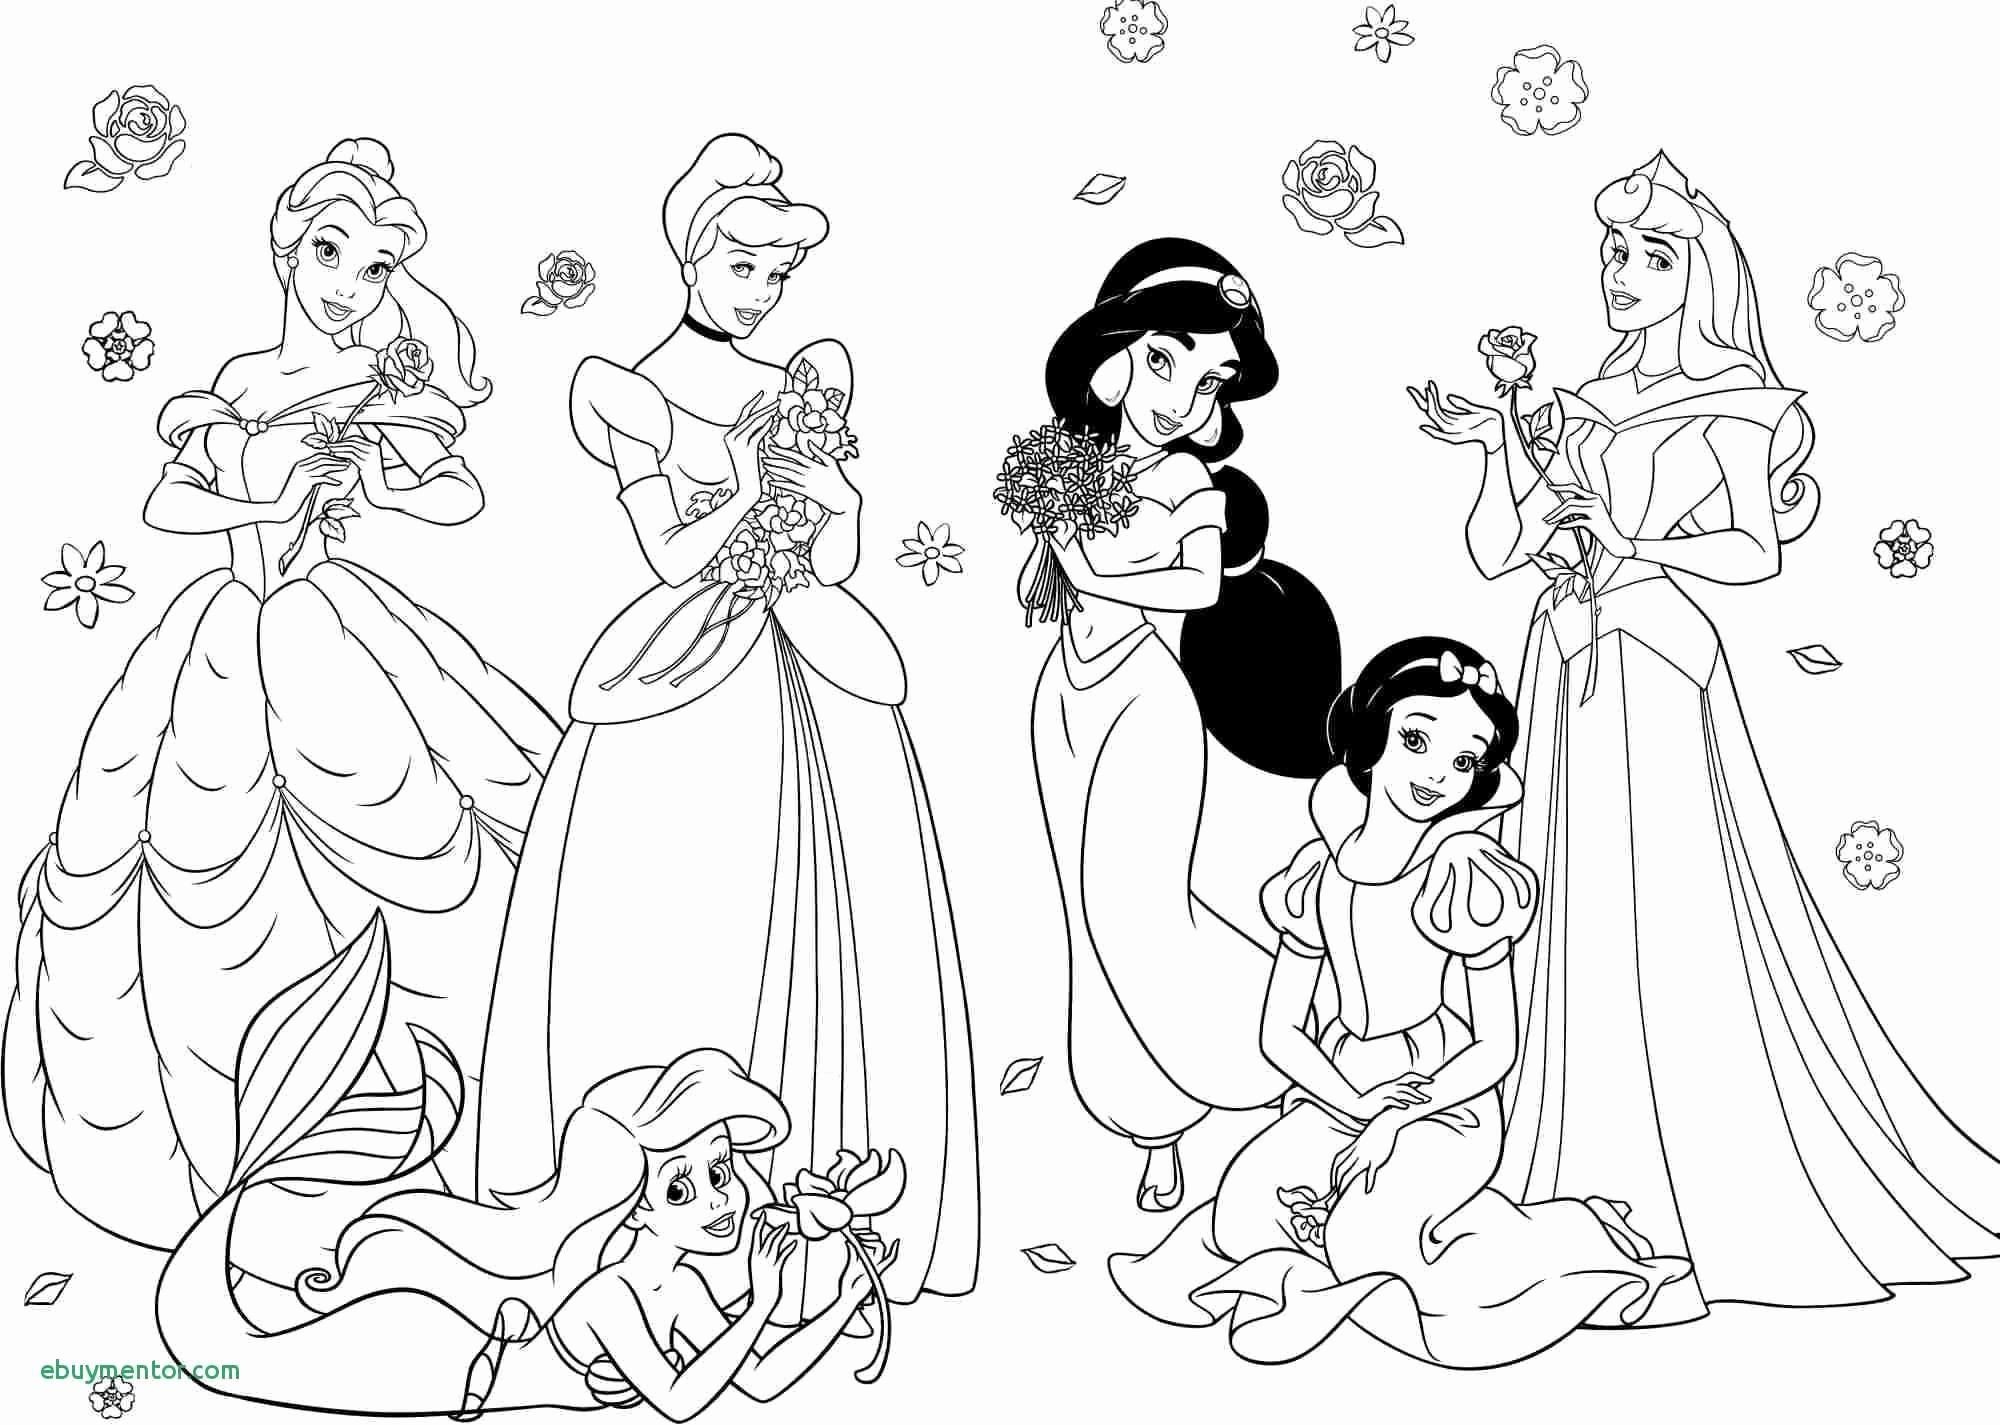 Princess Coloring Sheets Printable Luxury 40 Inspirational Princess Colouring Gam Disney Princess Coloring Pages Disney Princess Colors Rapunzel Coloring Pages